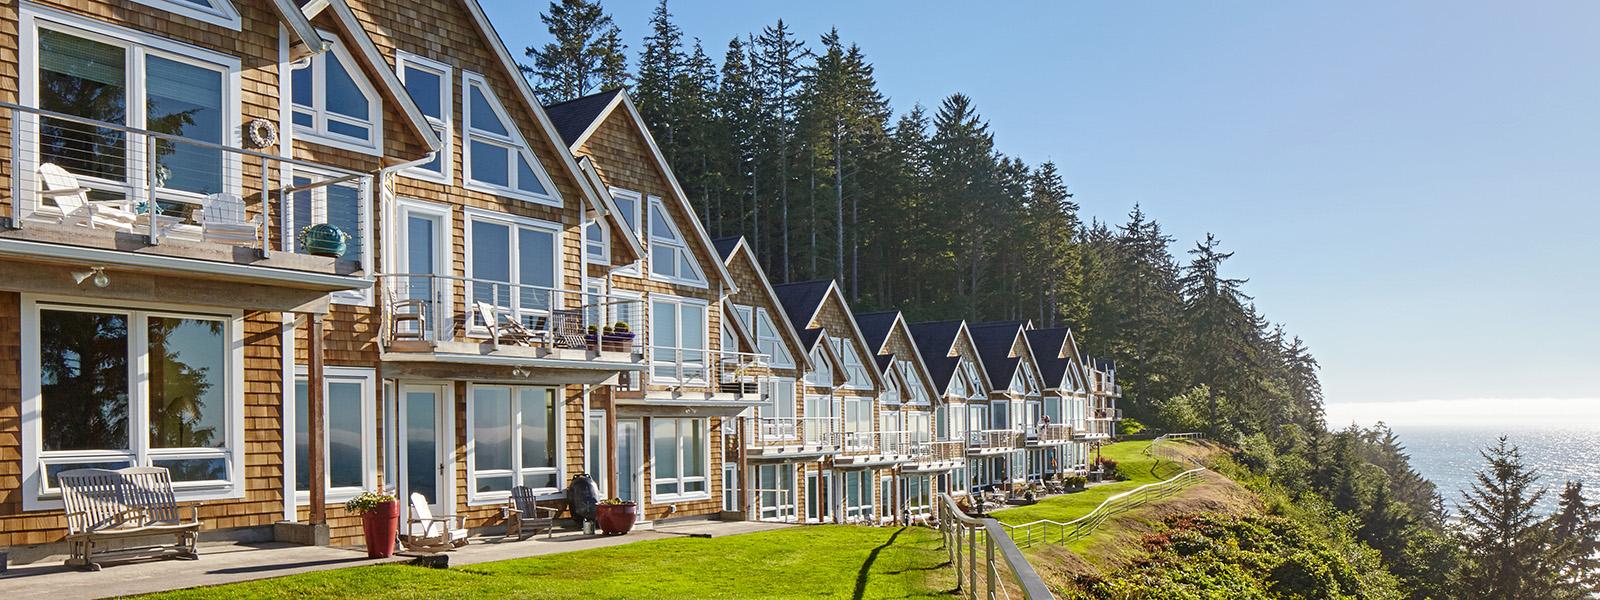 Whaler's Point Condominiums - Seaside, Oregon